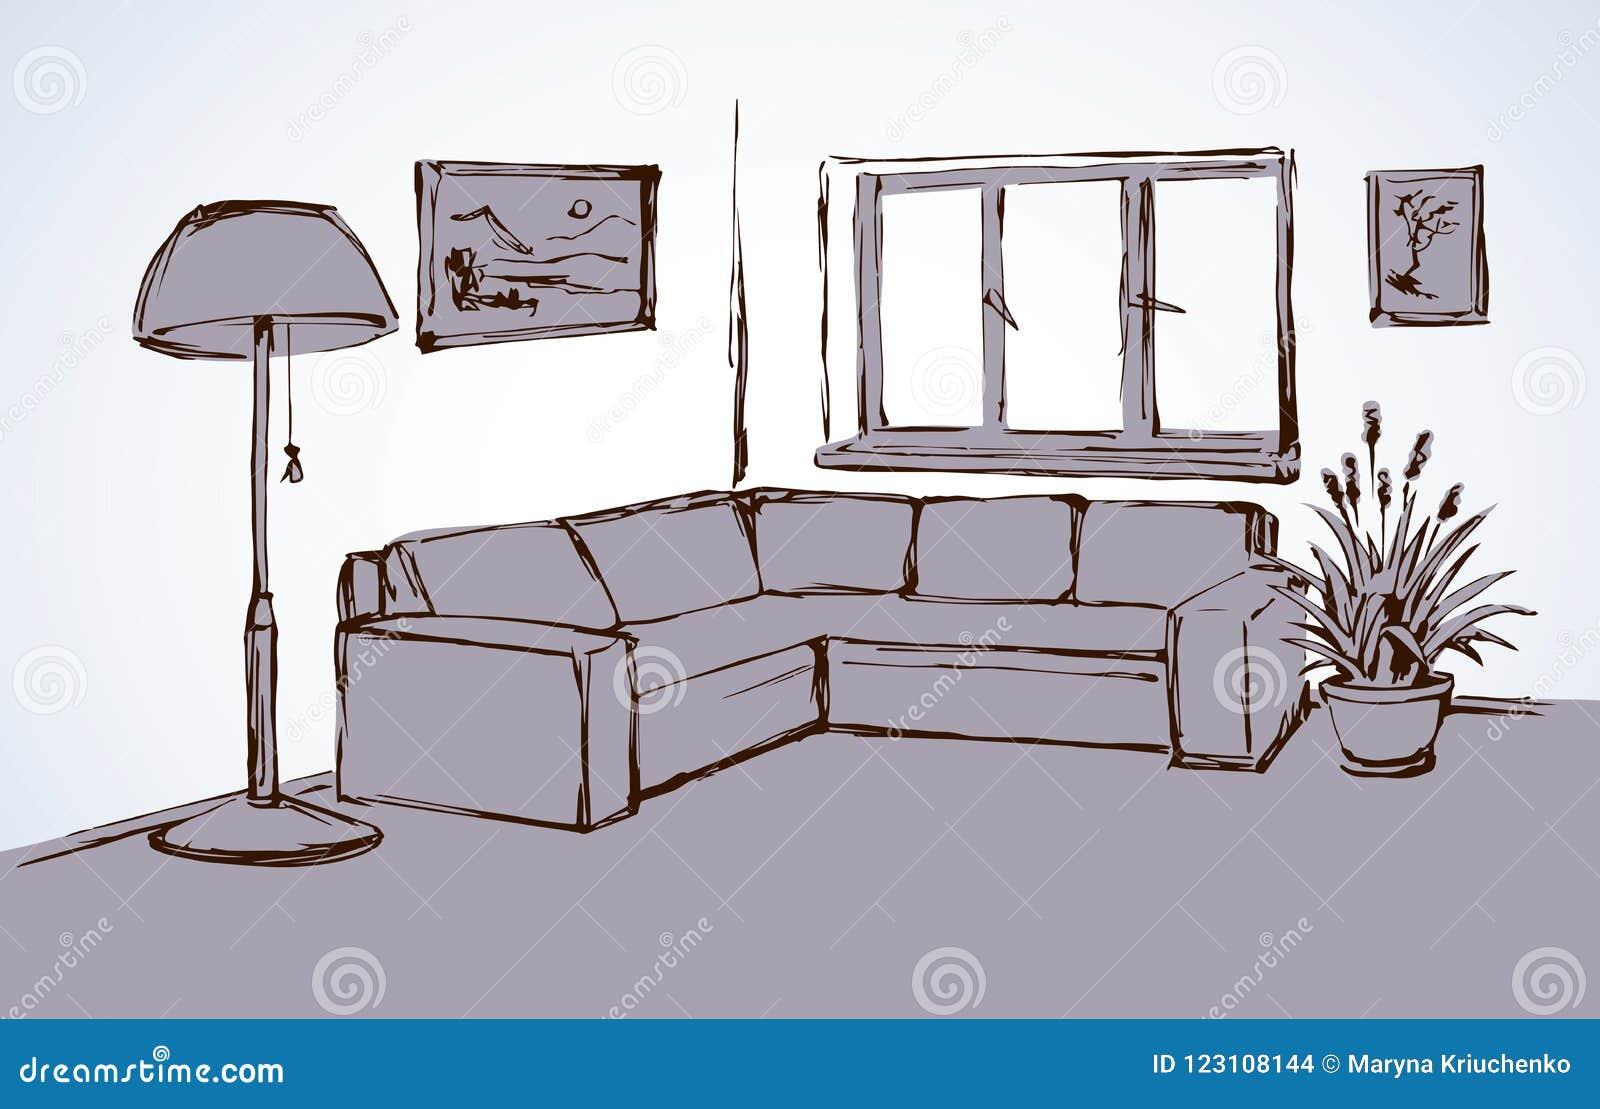 Corner Sofa Vector Drawing Stock Vector Illustration Of Doodle